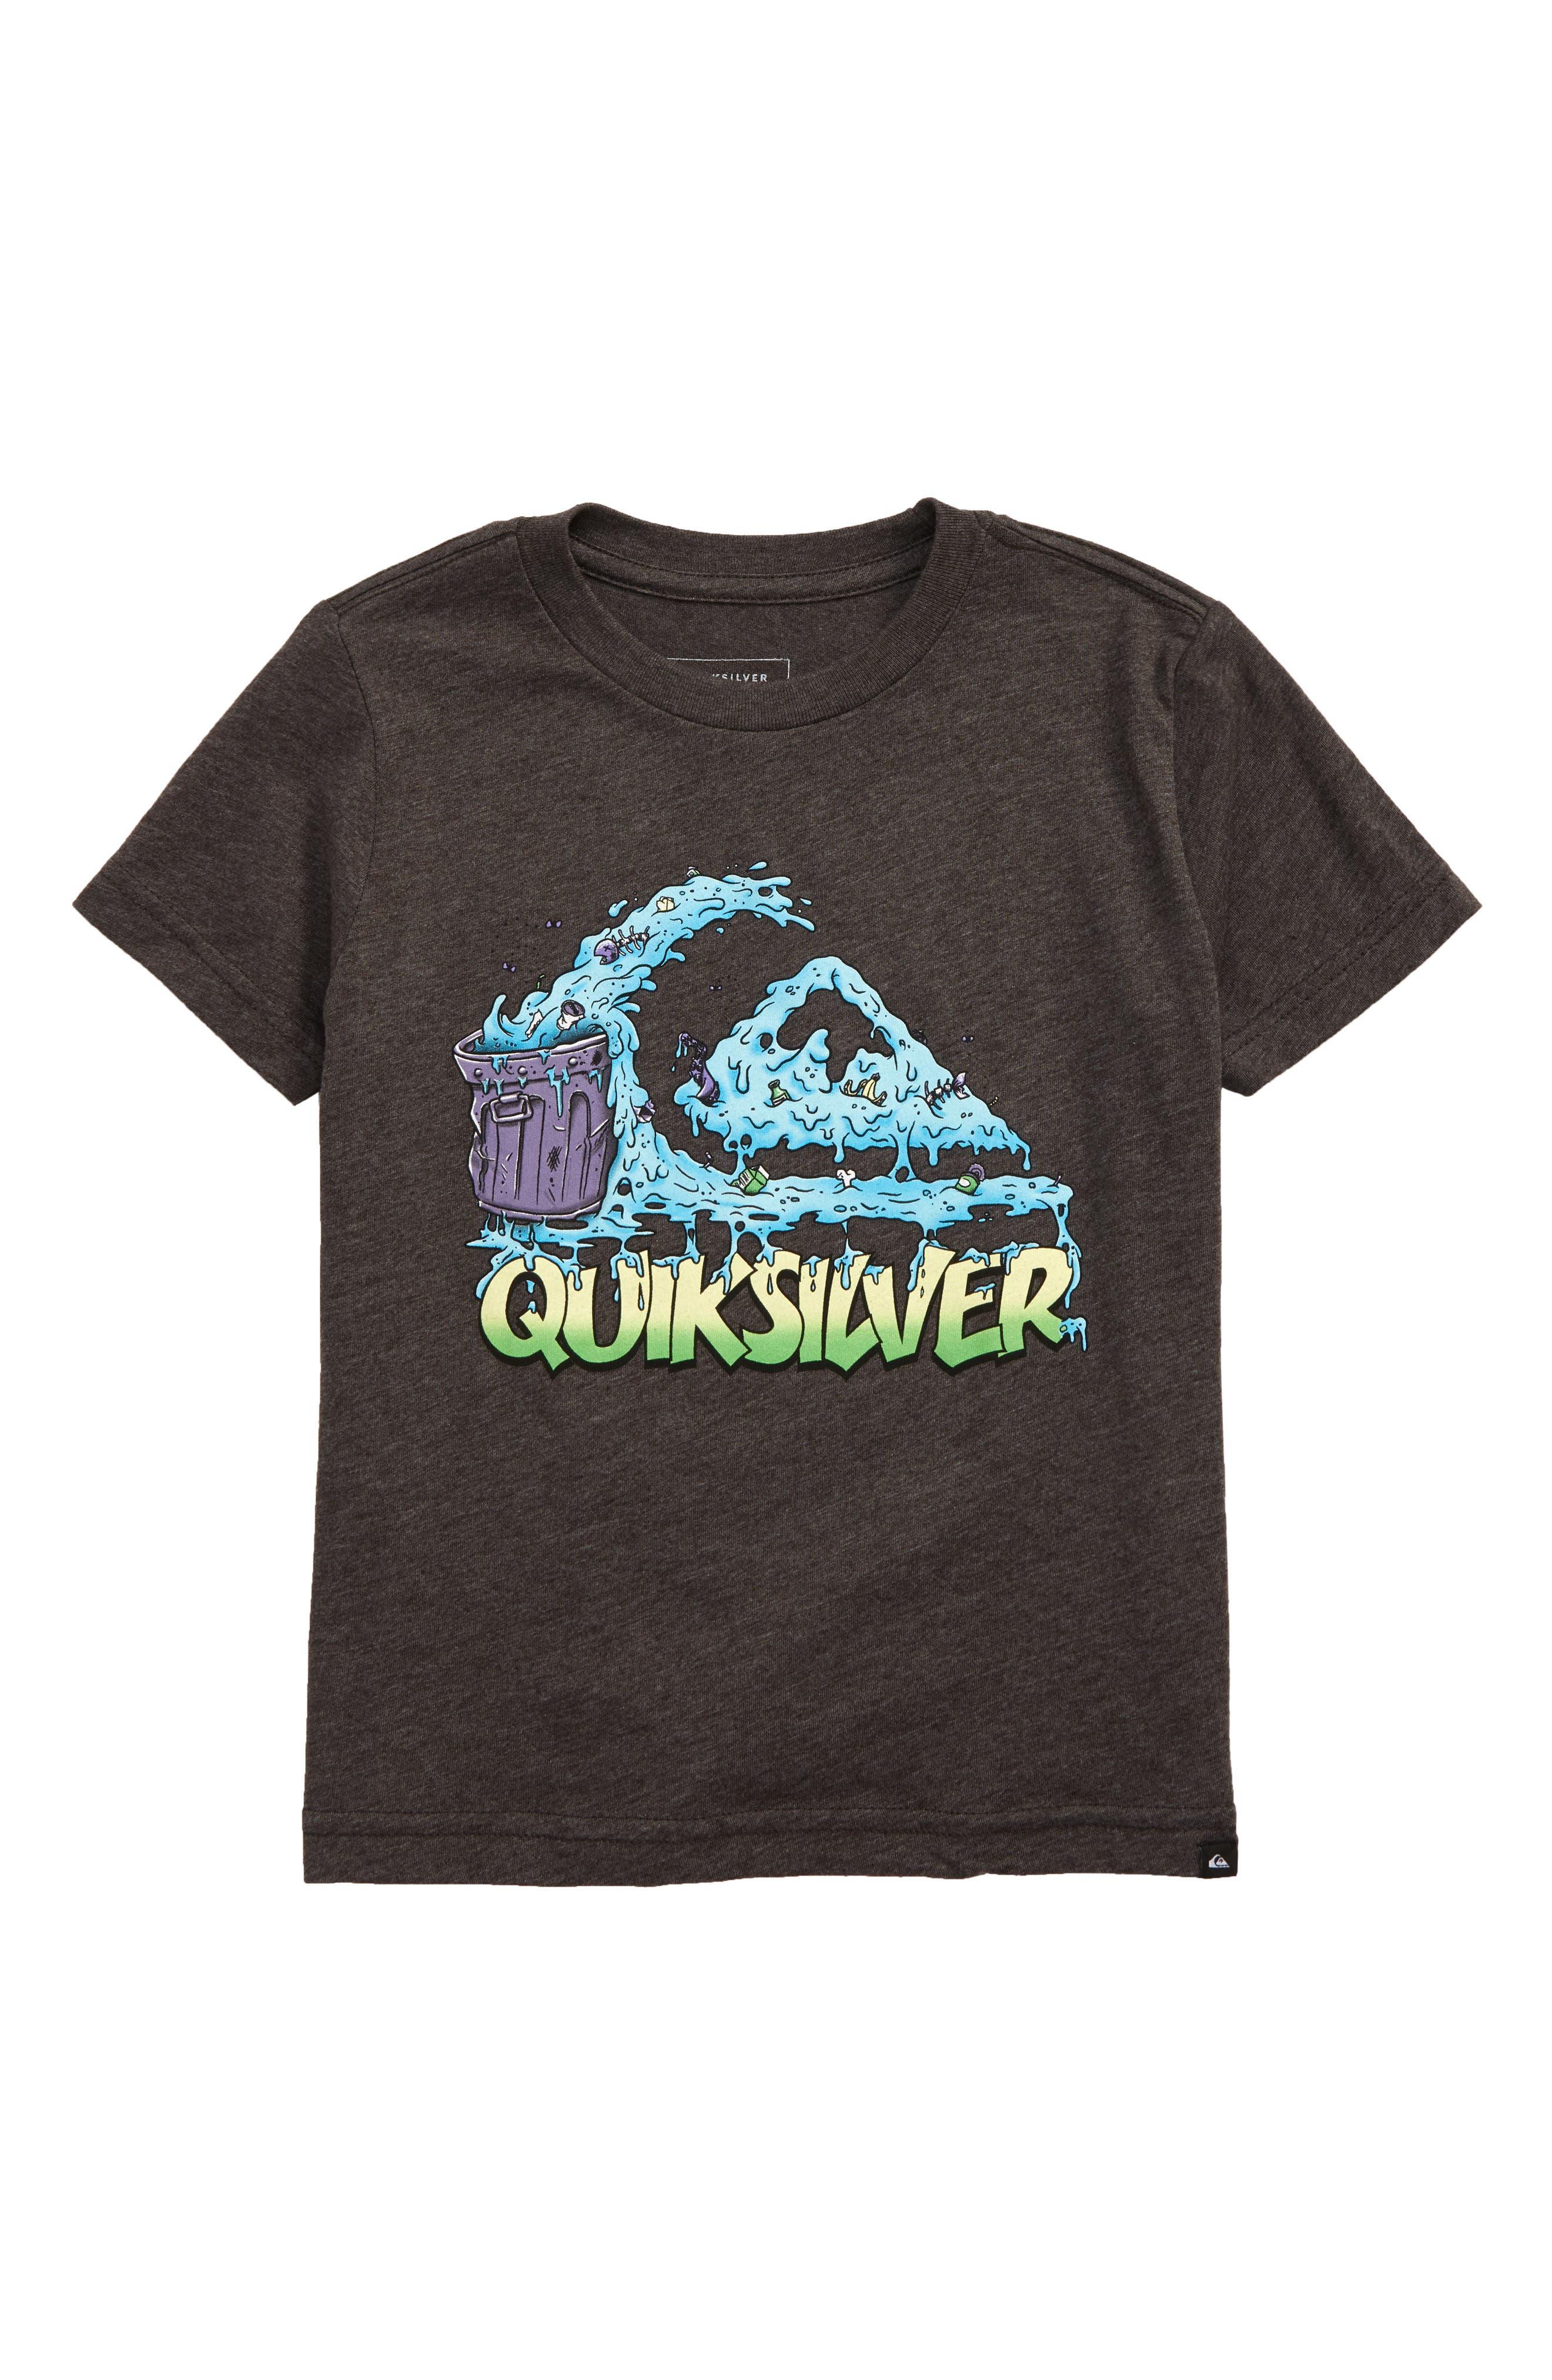 Toddler Boys Quiksilver Green Cruz Graphic TShirt Size 3T  Grey